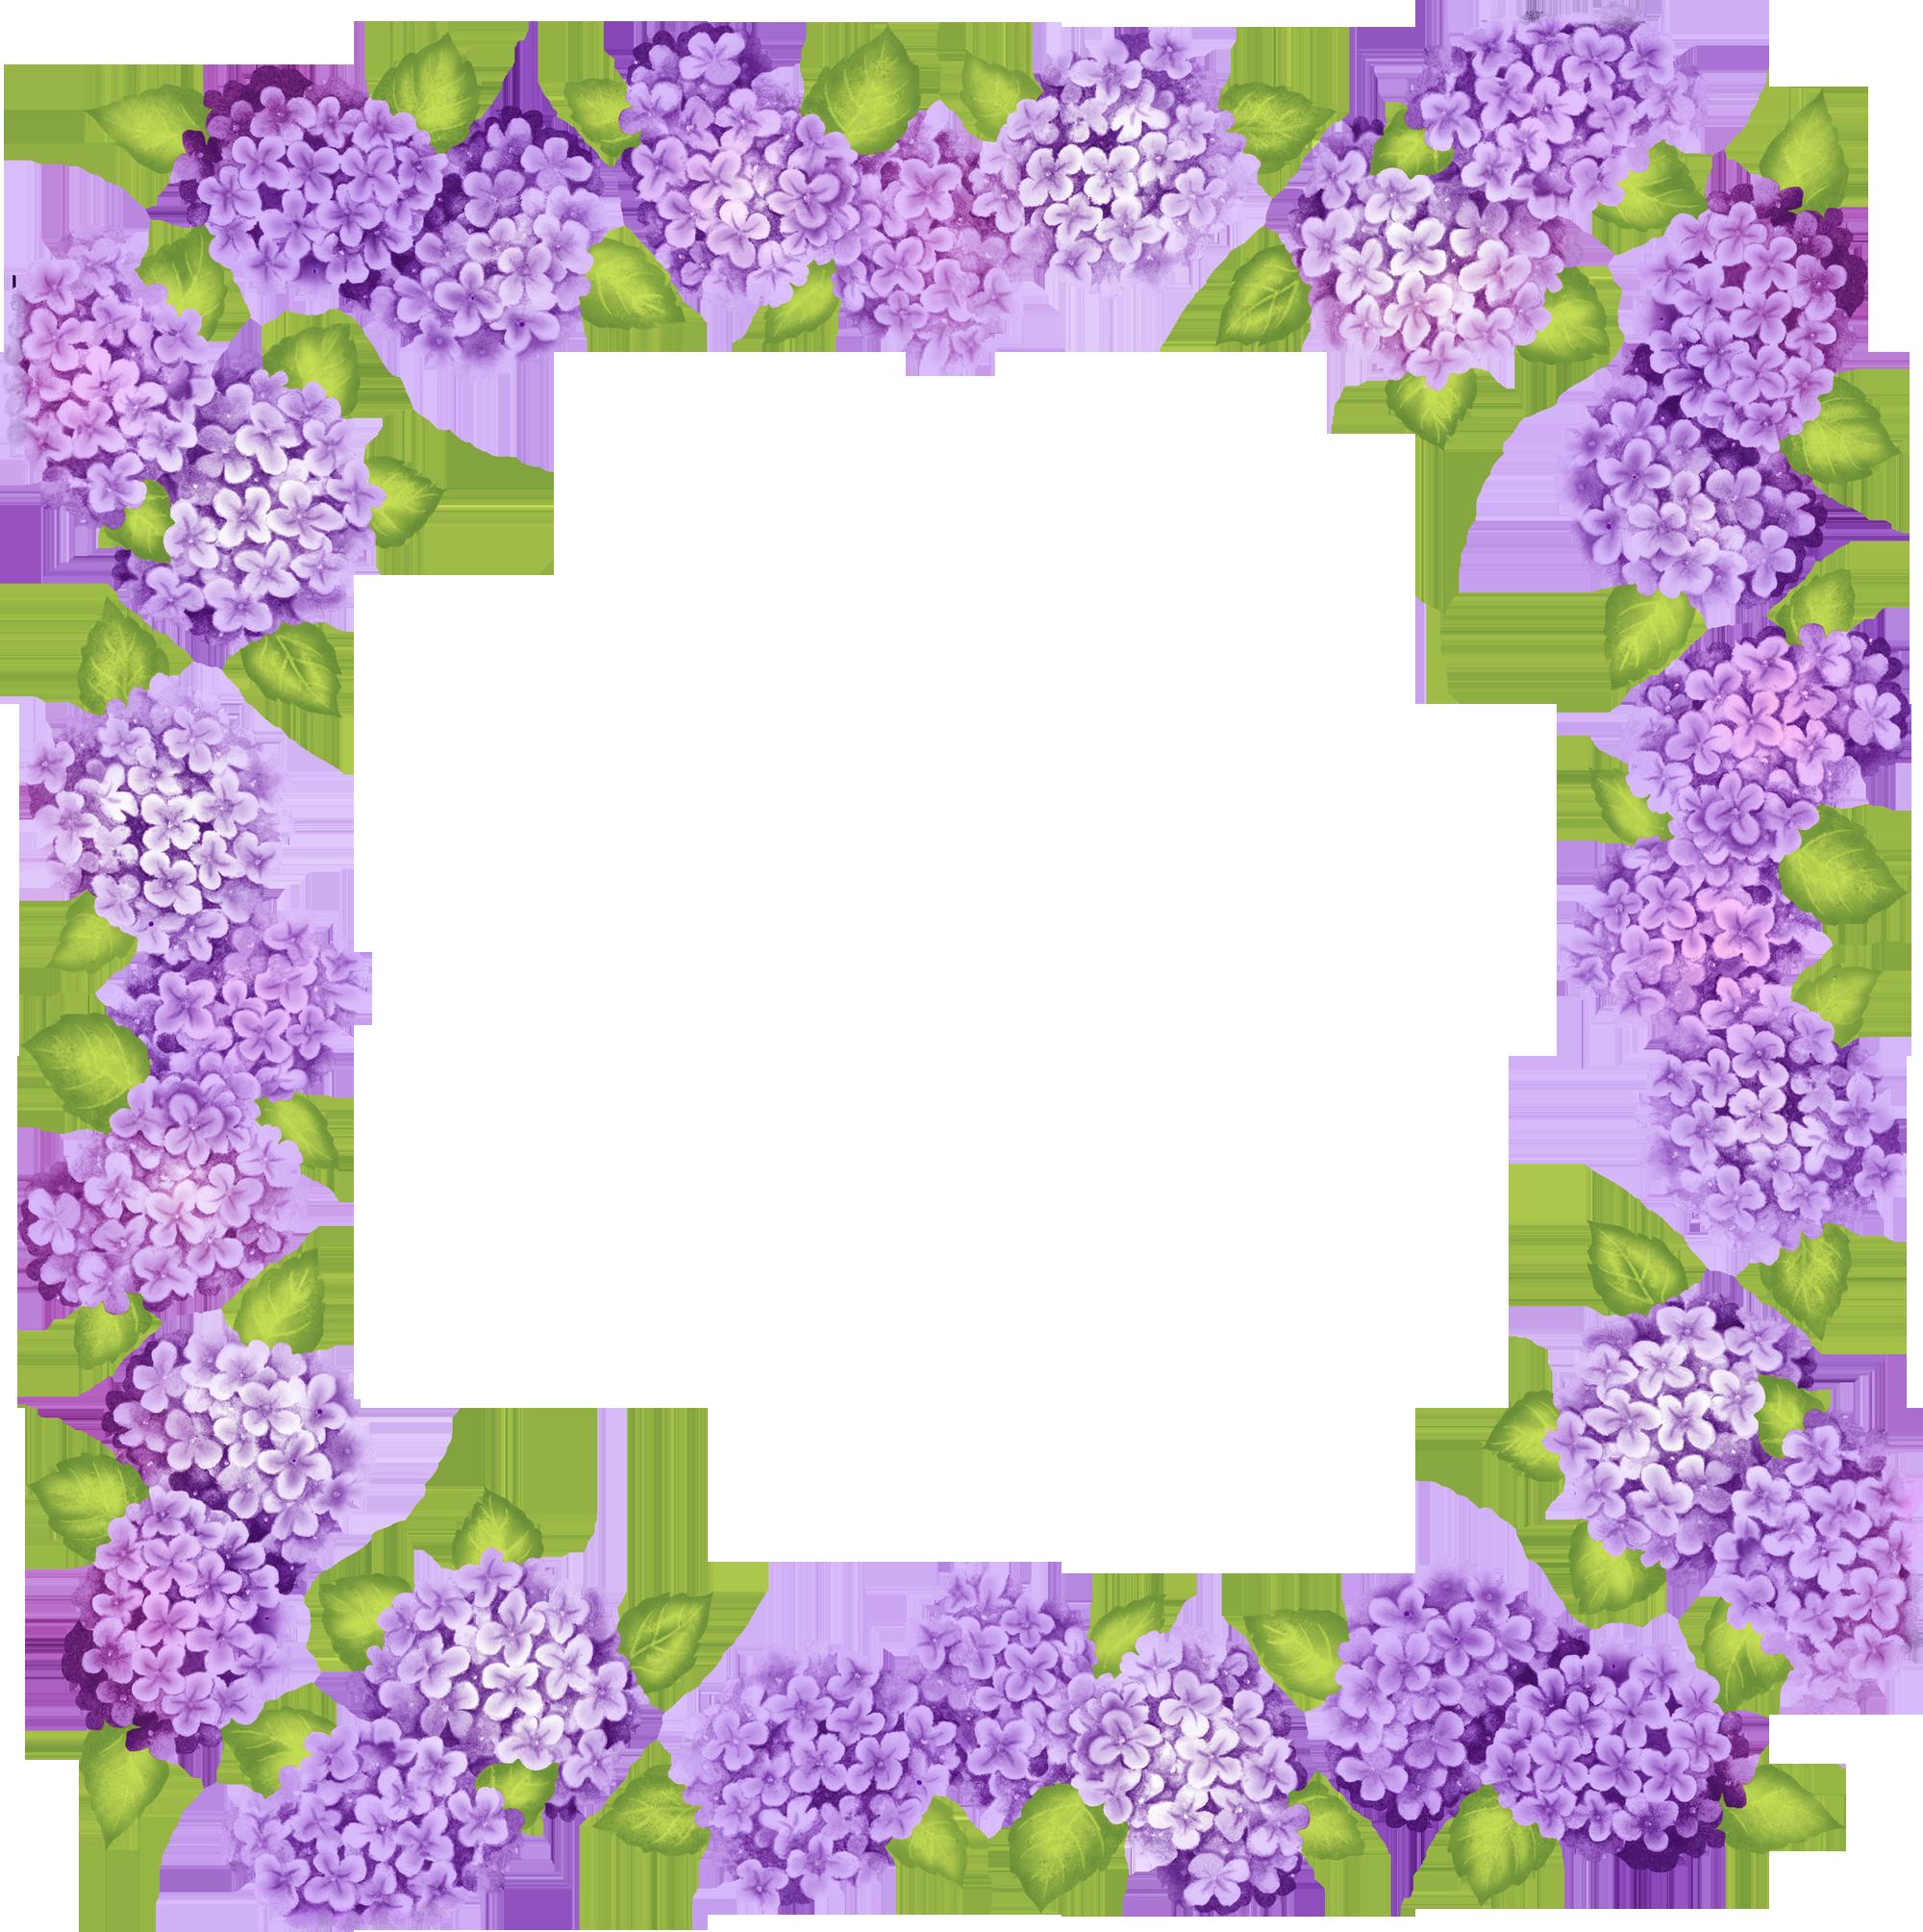 Lavendar flower clipart clip Transparent Purple Frame | Purple Frame Polyvore Edits | Frames 1 ... clip